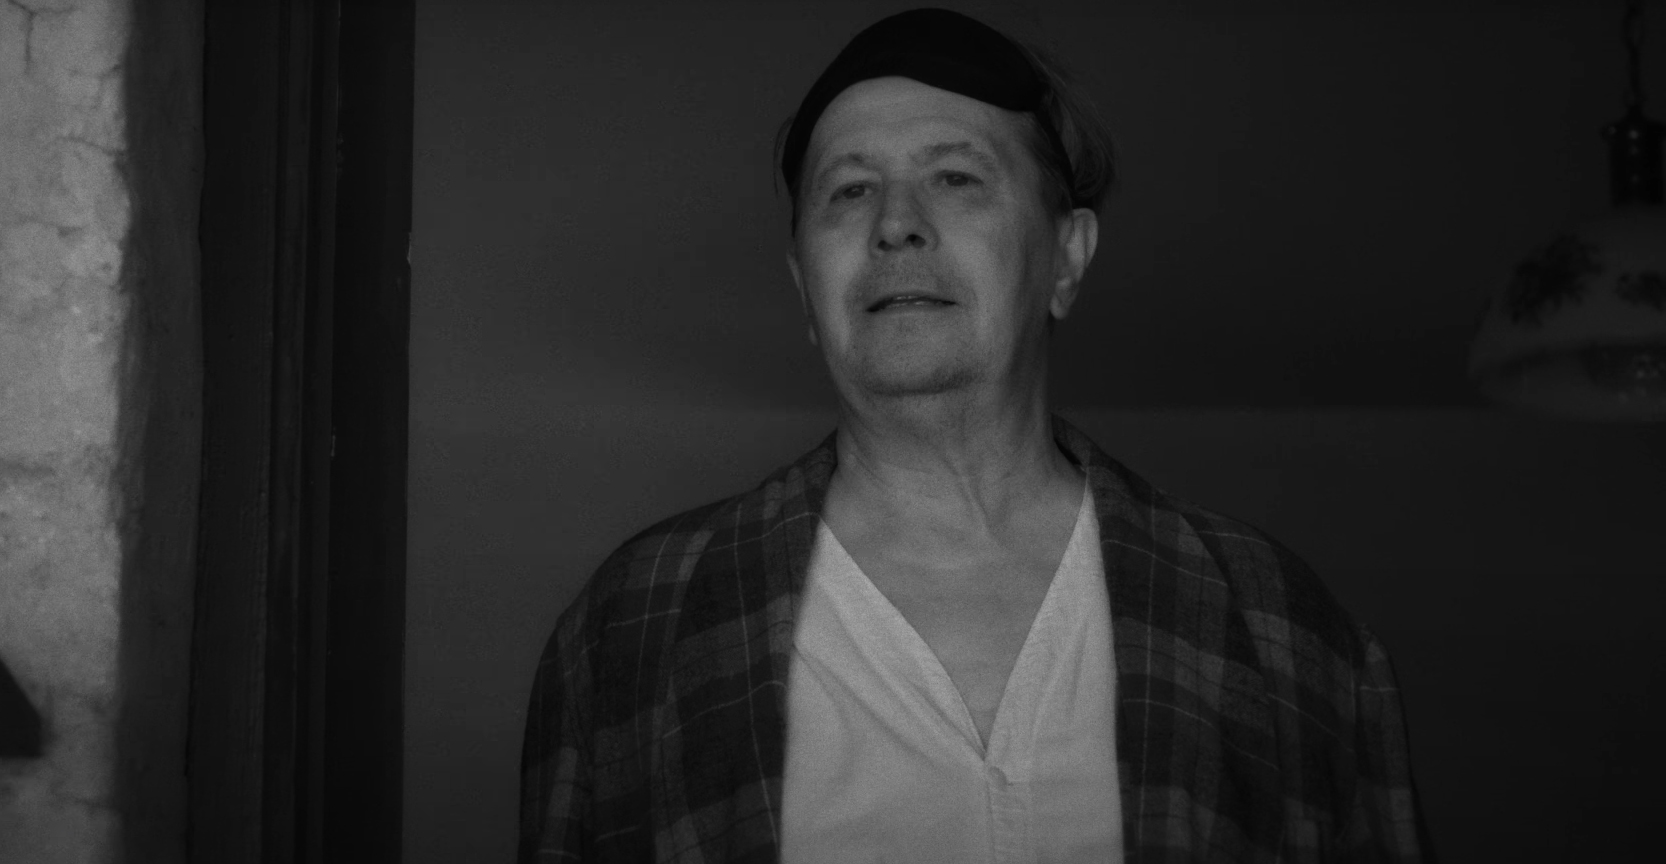 Aquí el primer tráiler oficial de 'MANK' David Fincher para Netflix